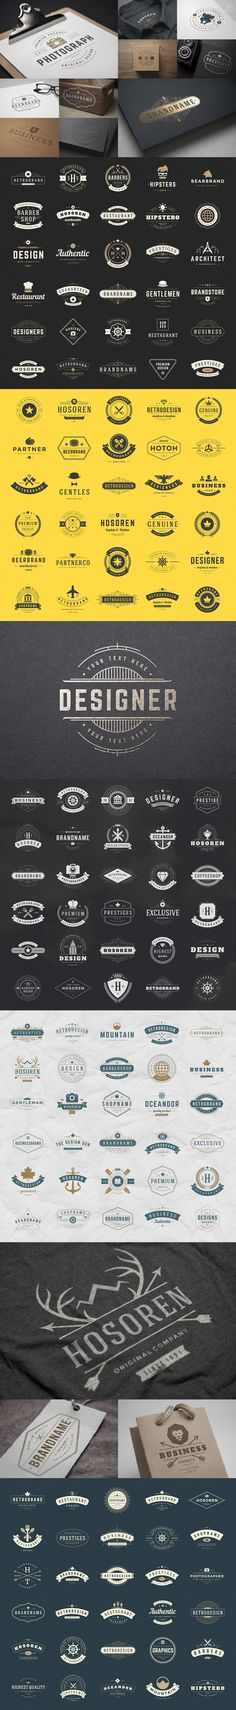 700 logos and badges bundle by Vasya Kobelev on Creative Market